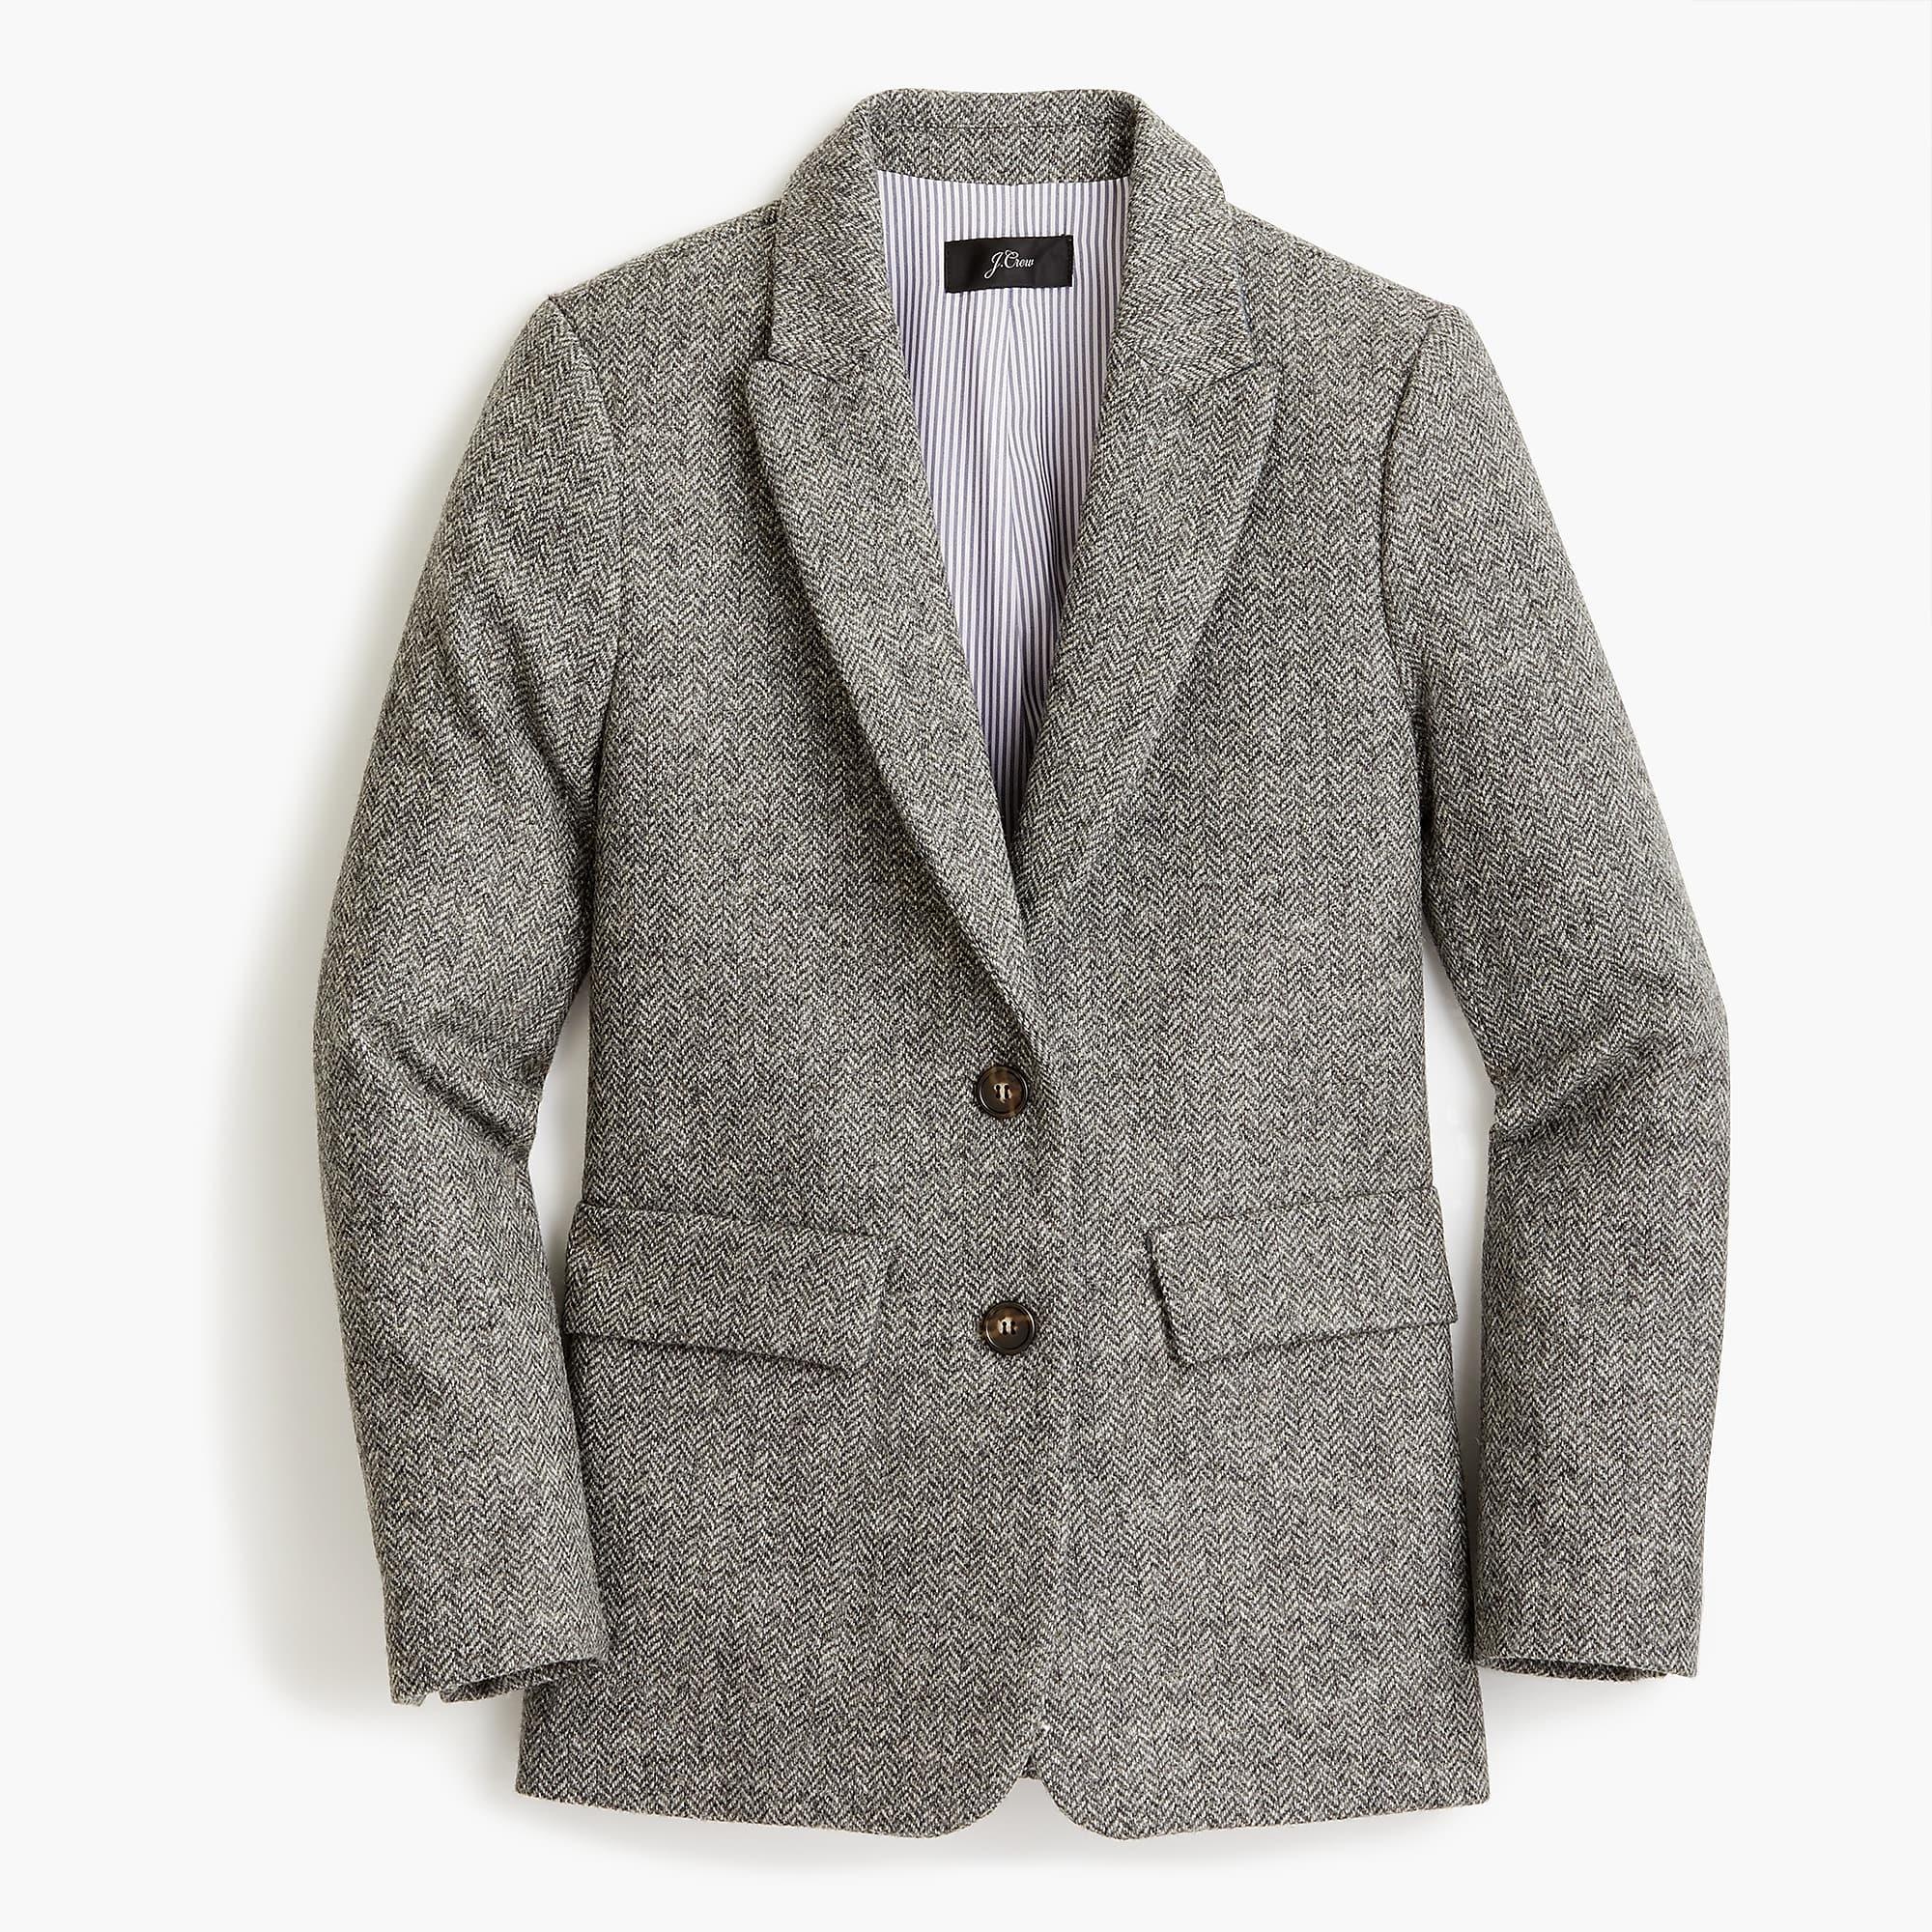 Petite boyfriend blazer in English herringbone wool